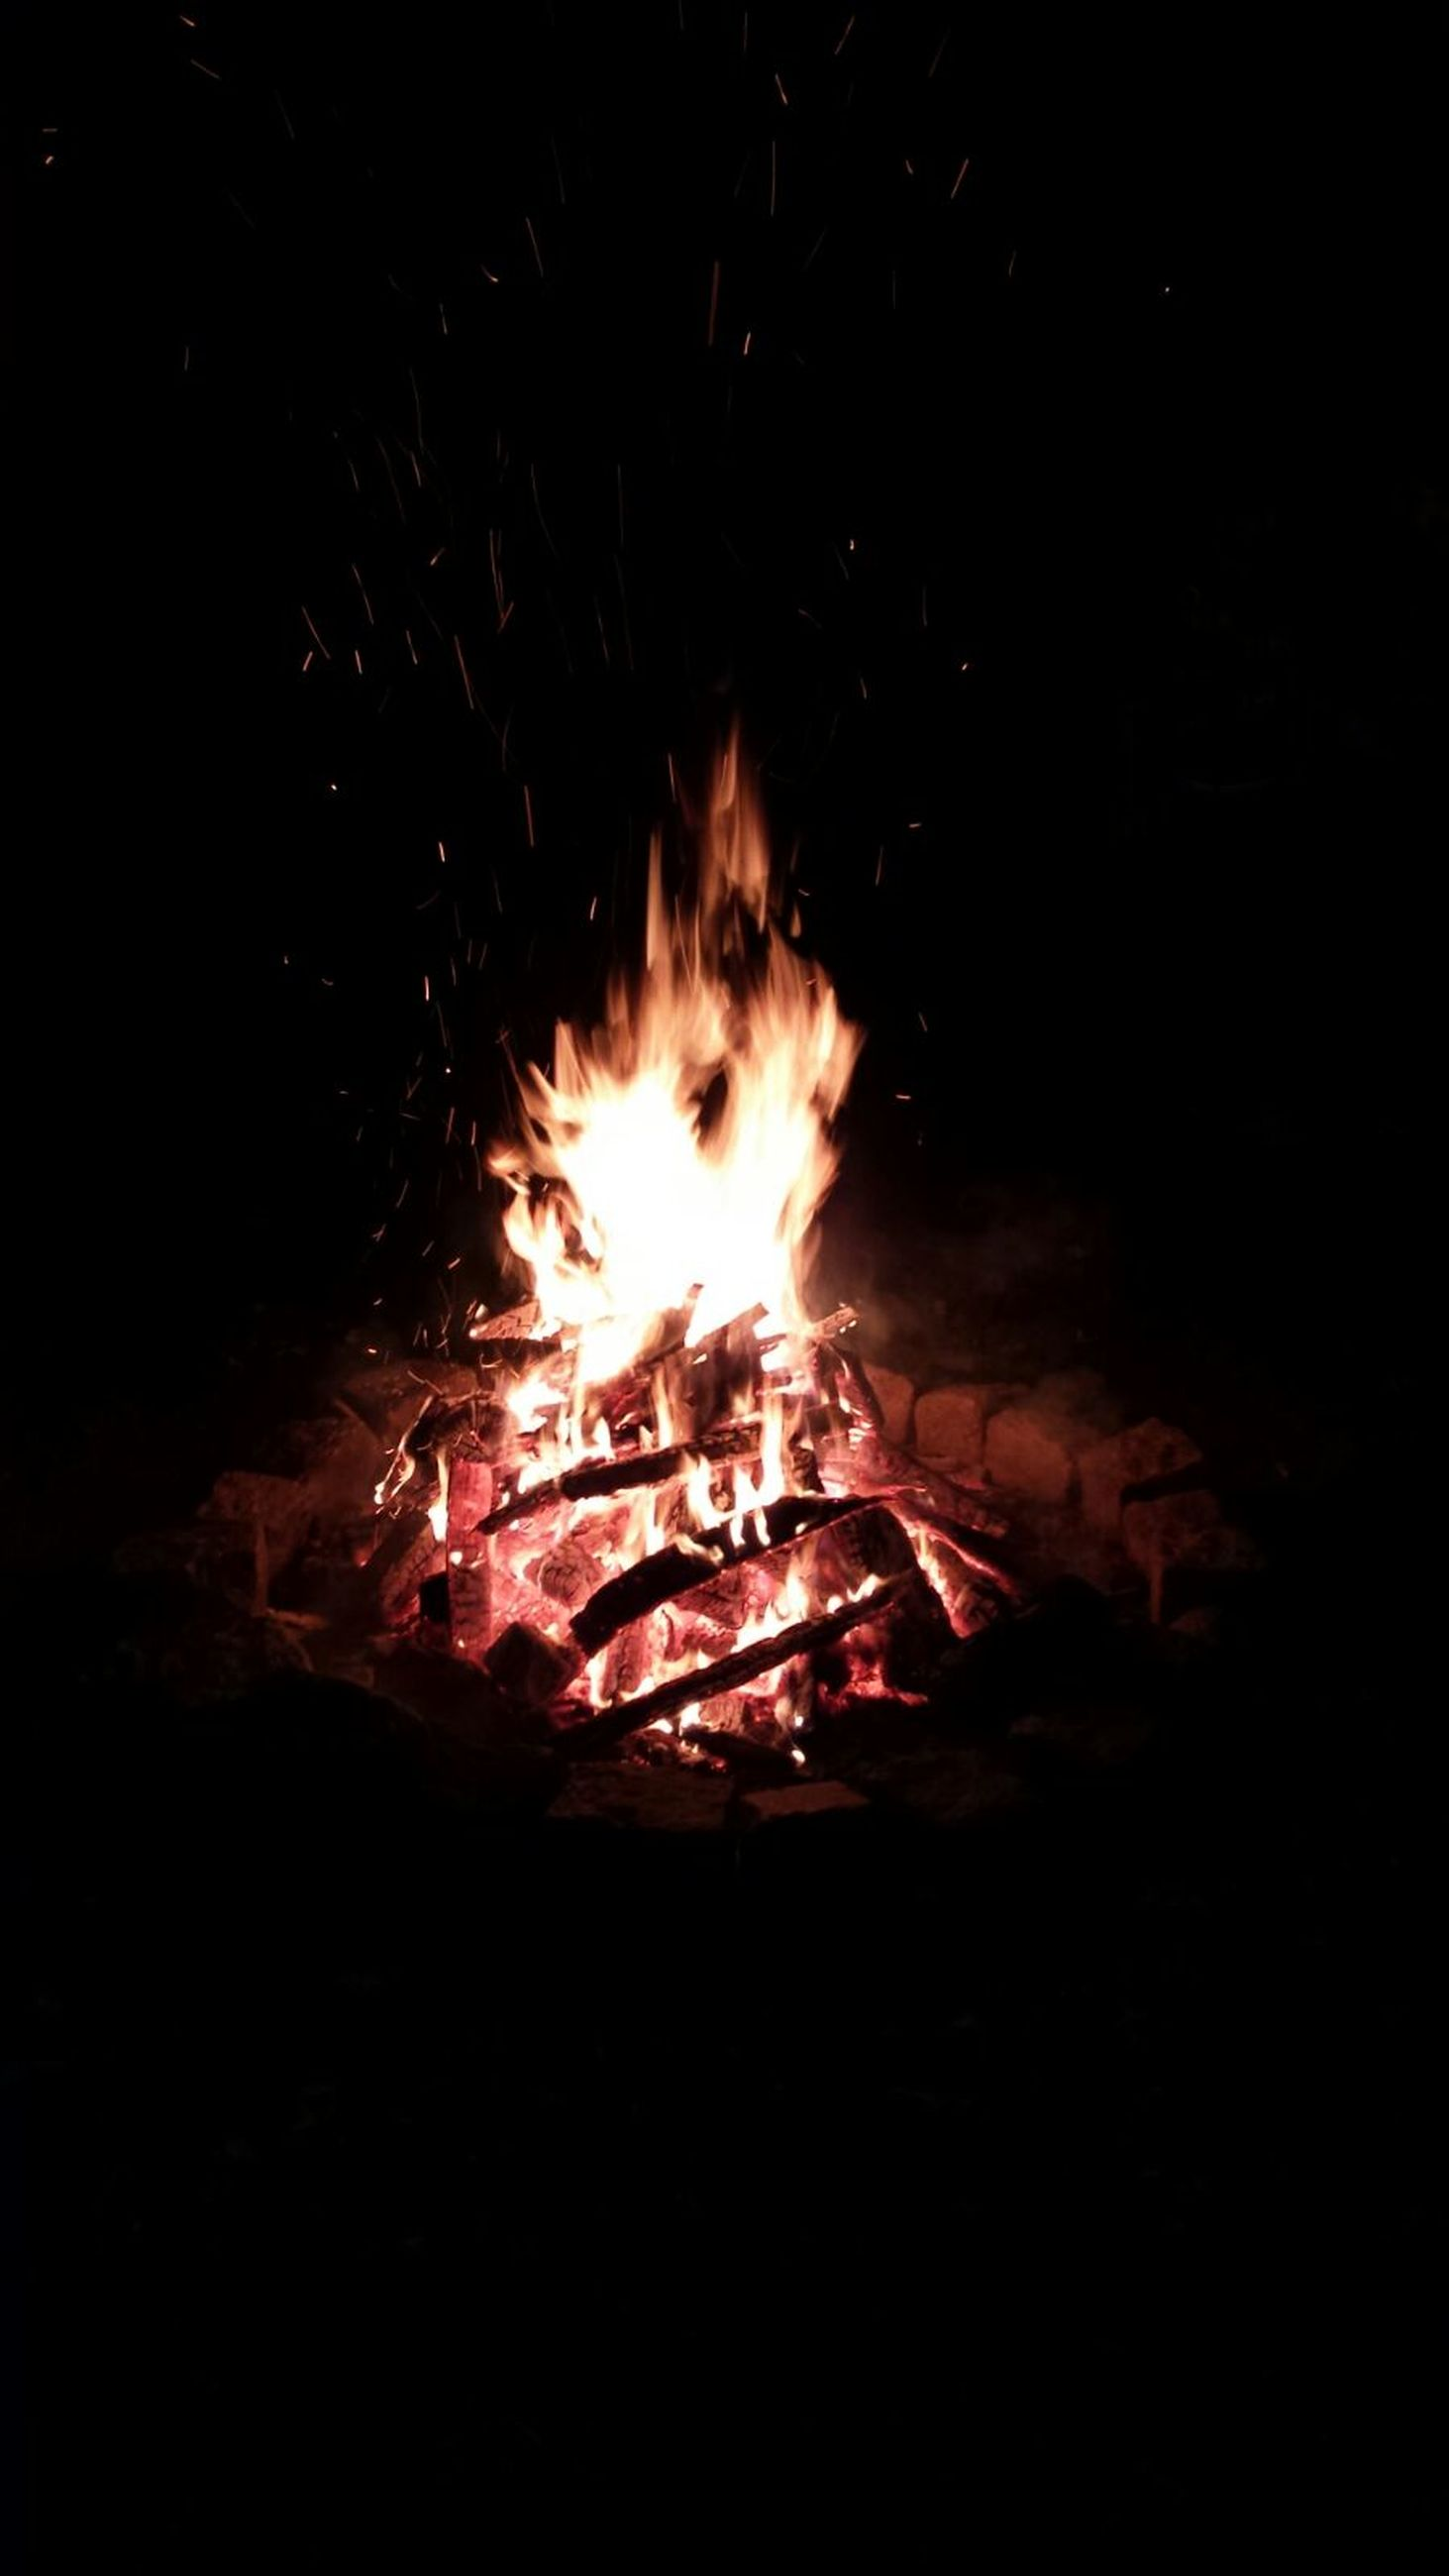 burning, fire - natural phenomenon, flame, night, heat - temperature, glowing, bonfire, firewood, fire, motion, dark, illuminated, long exposure, campfire, heat, light - natural phenomenon, close-up, orange color, no people, copy space